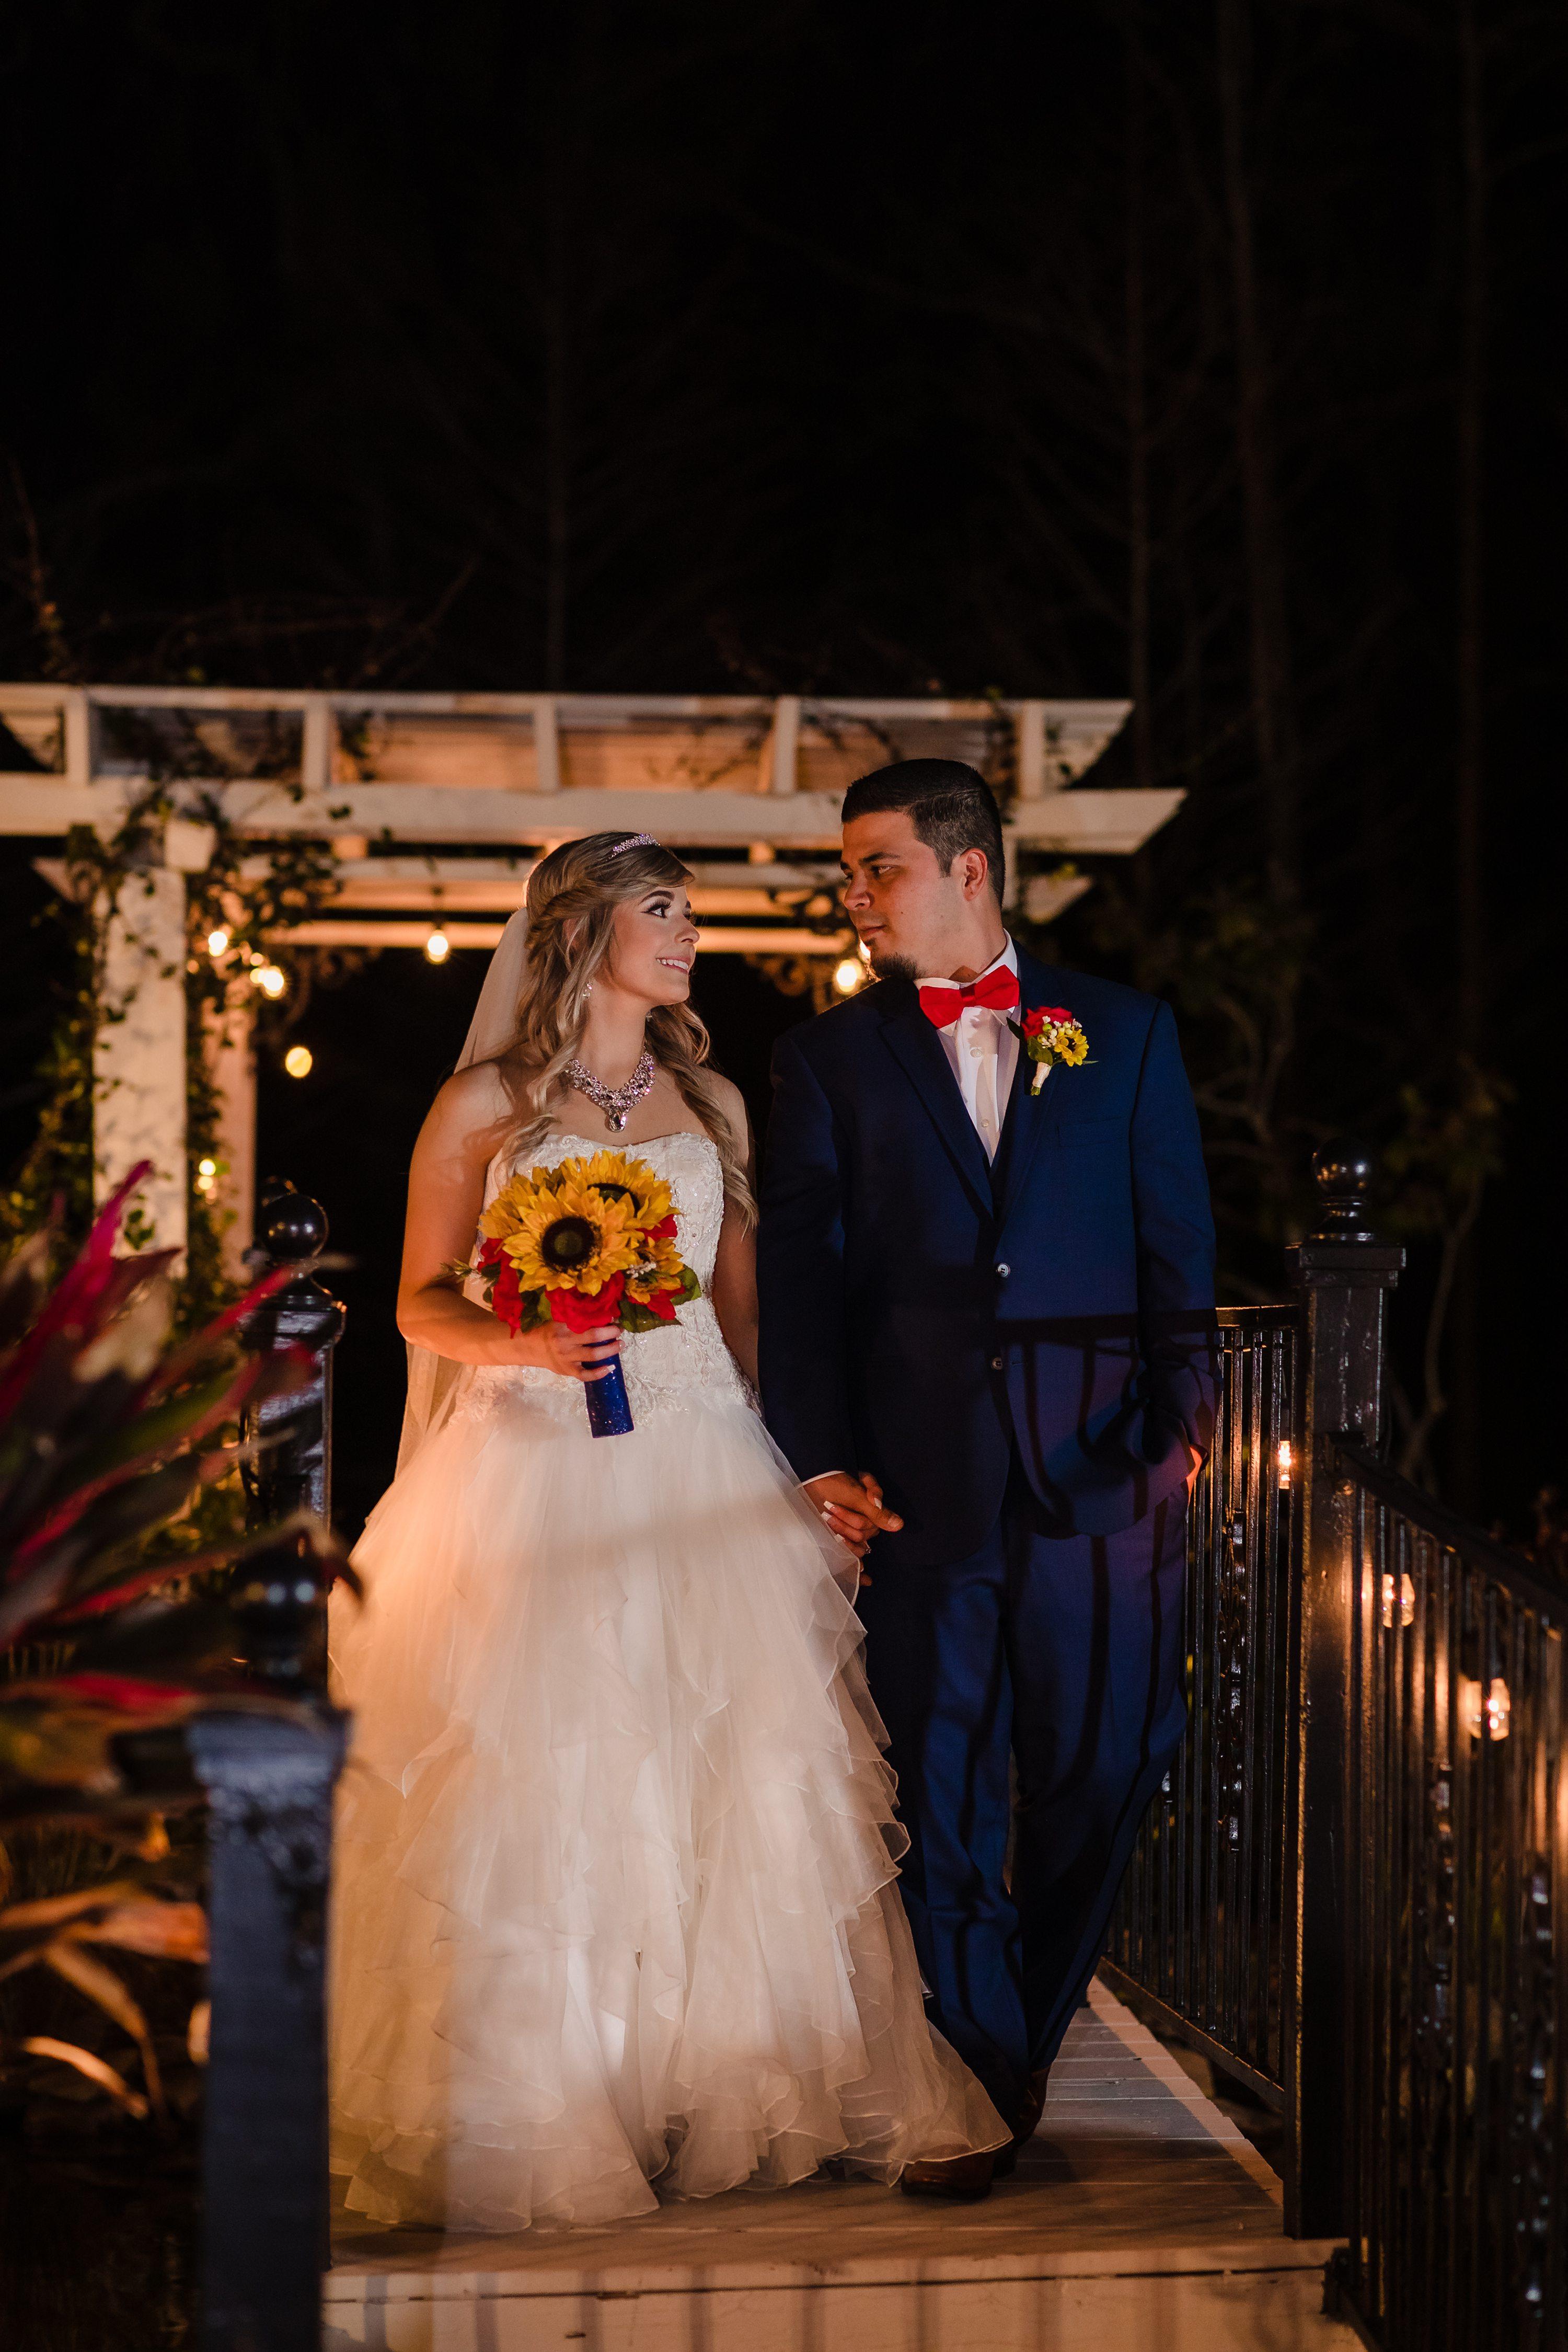 outdoor wedding photographer, The Gatehouse wedding venue